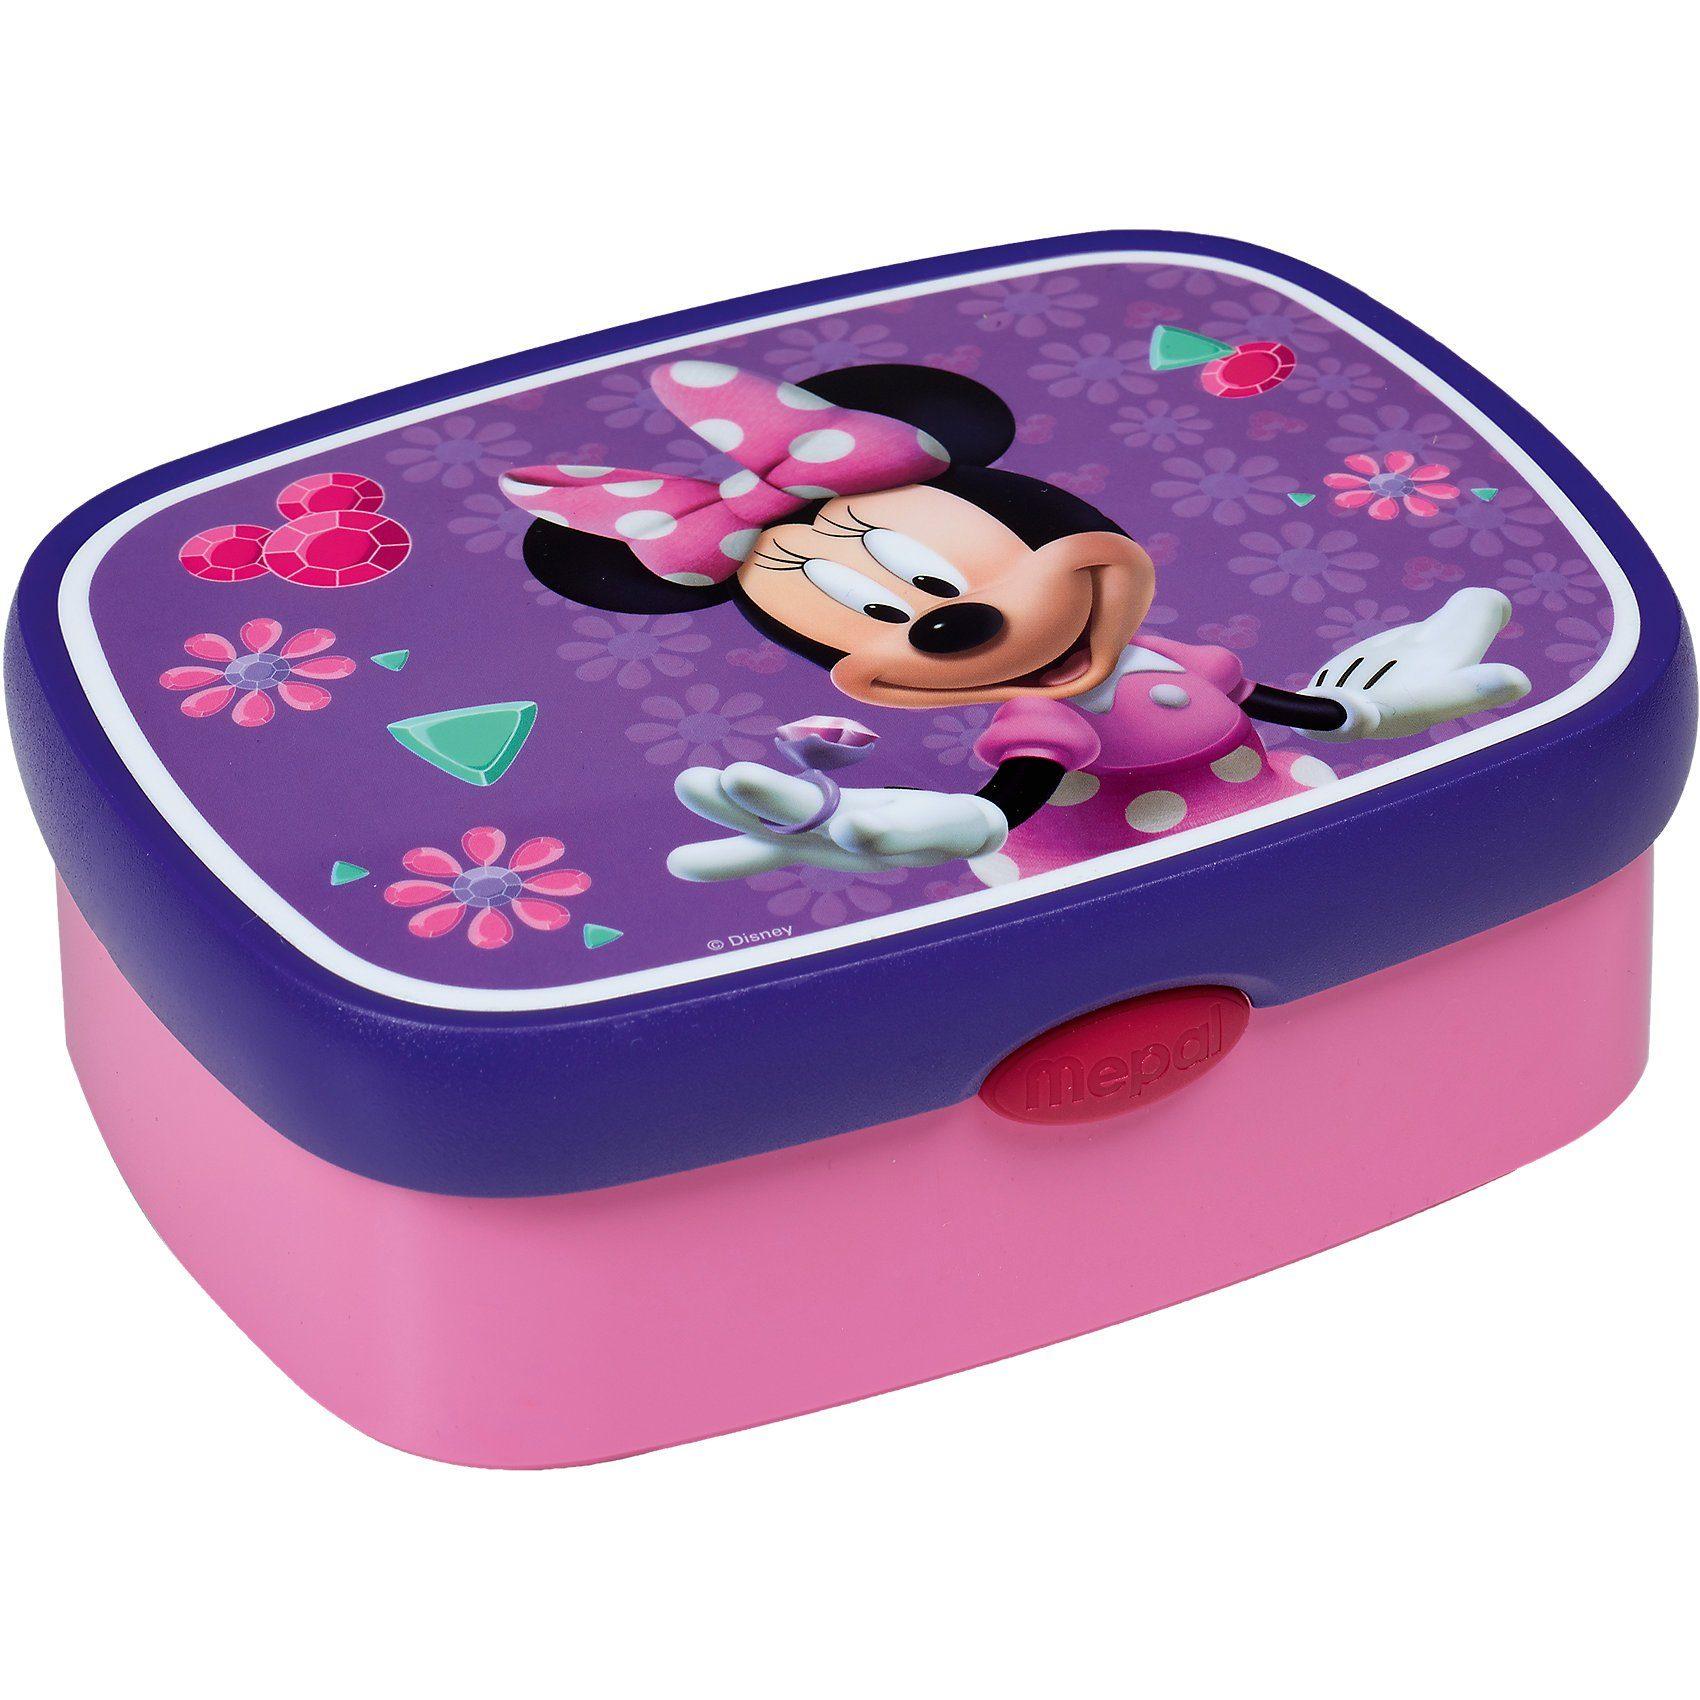 Brotdose Campus midi Minnie Mouse